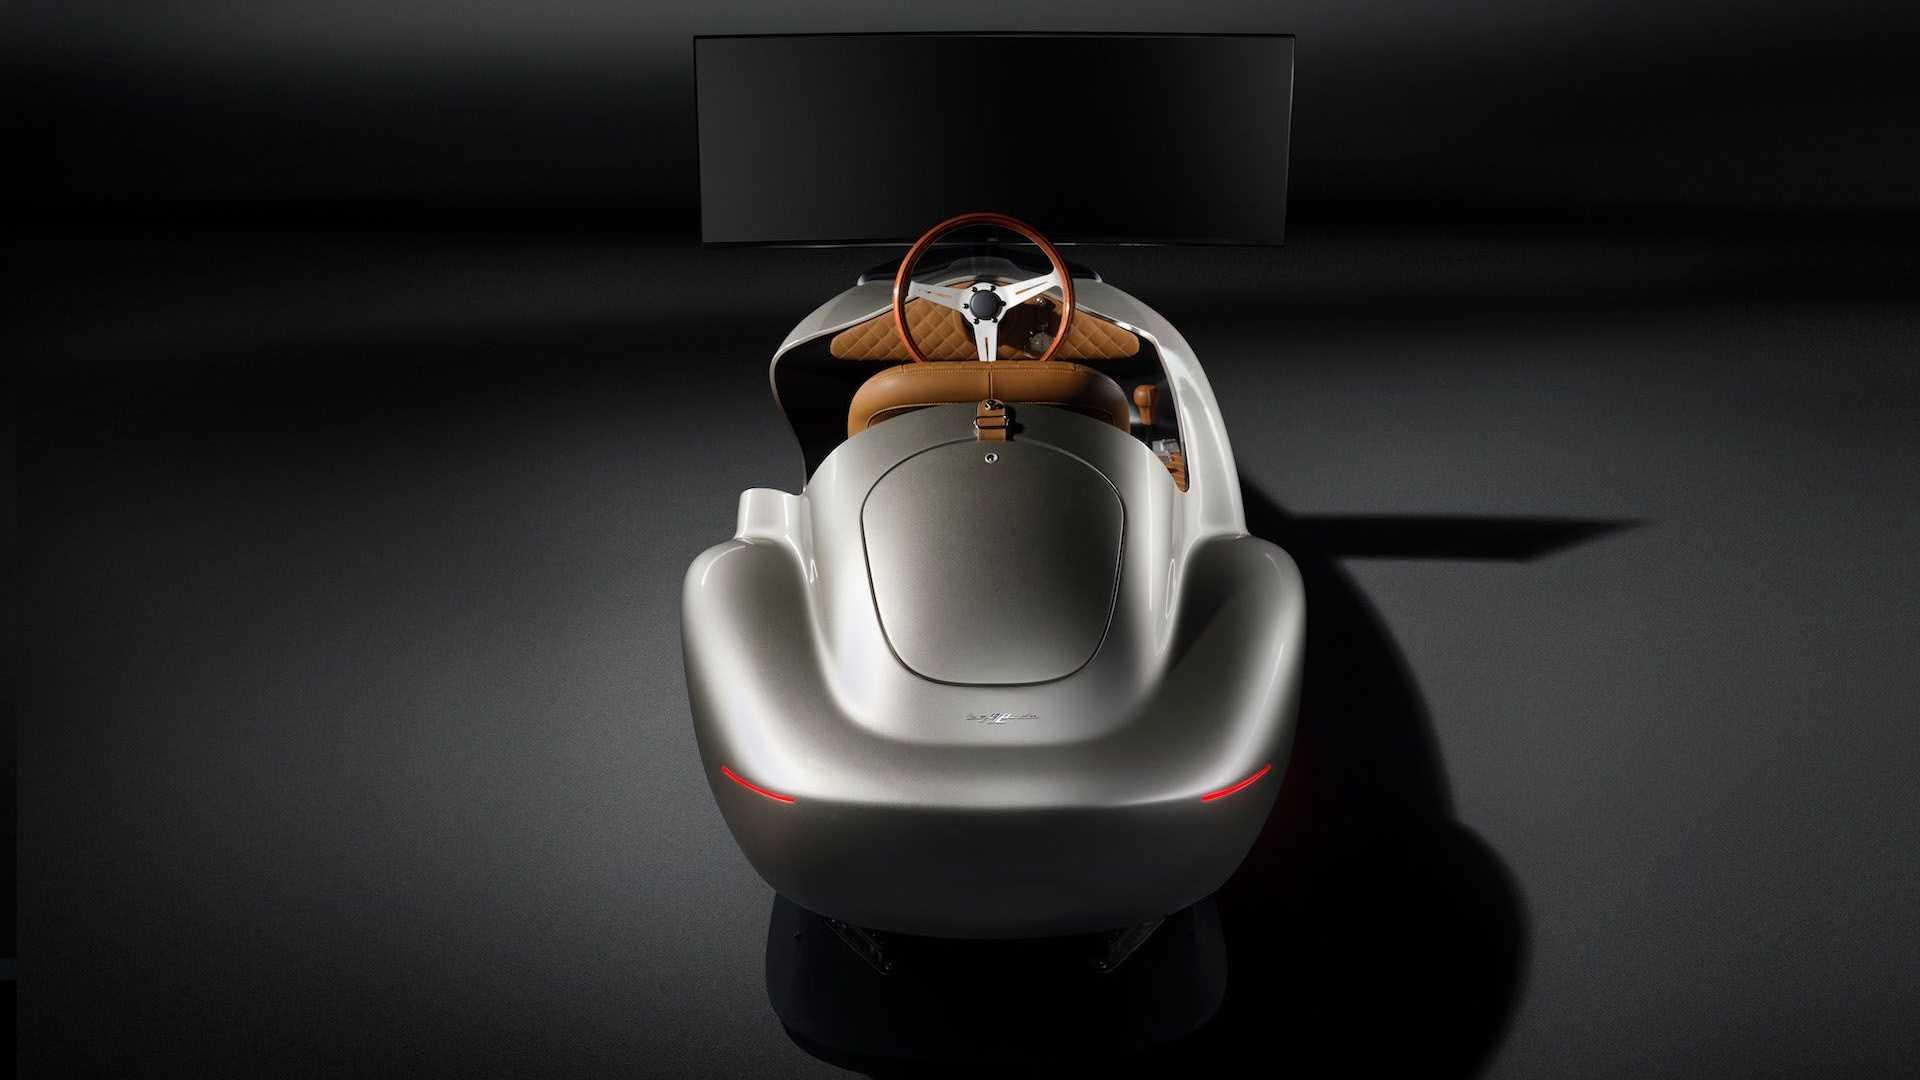 El Pininfarina Leggenda eClassic Simulator se basa en el Cisitalia 202